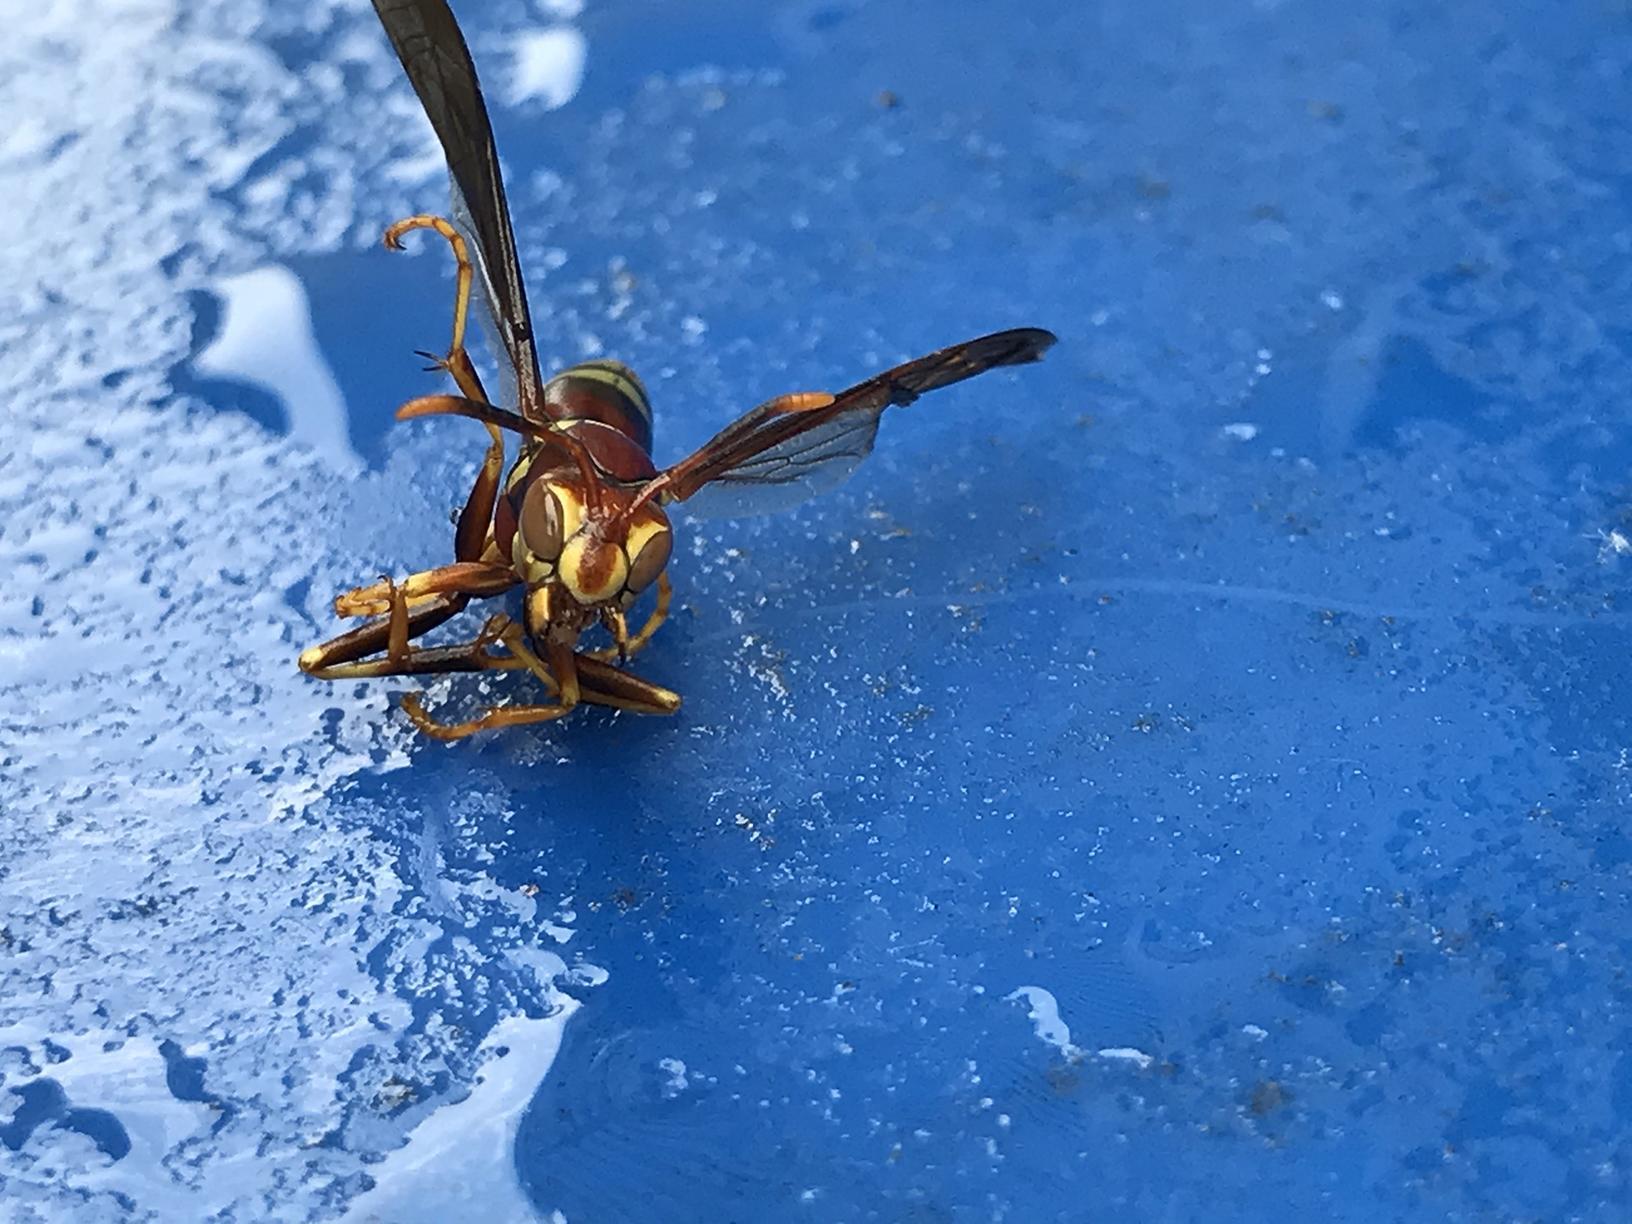 Entomology of Paper Wasps